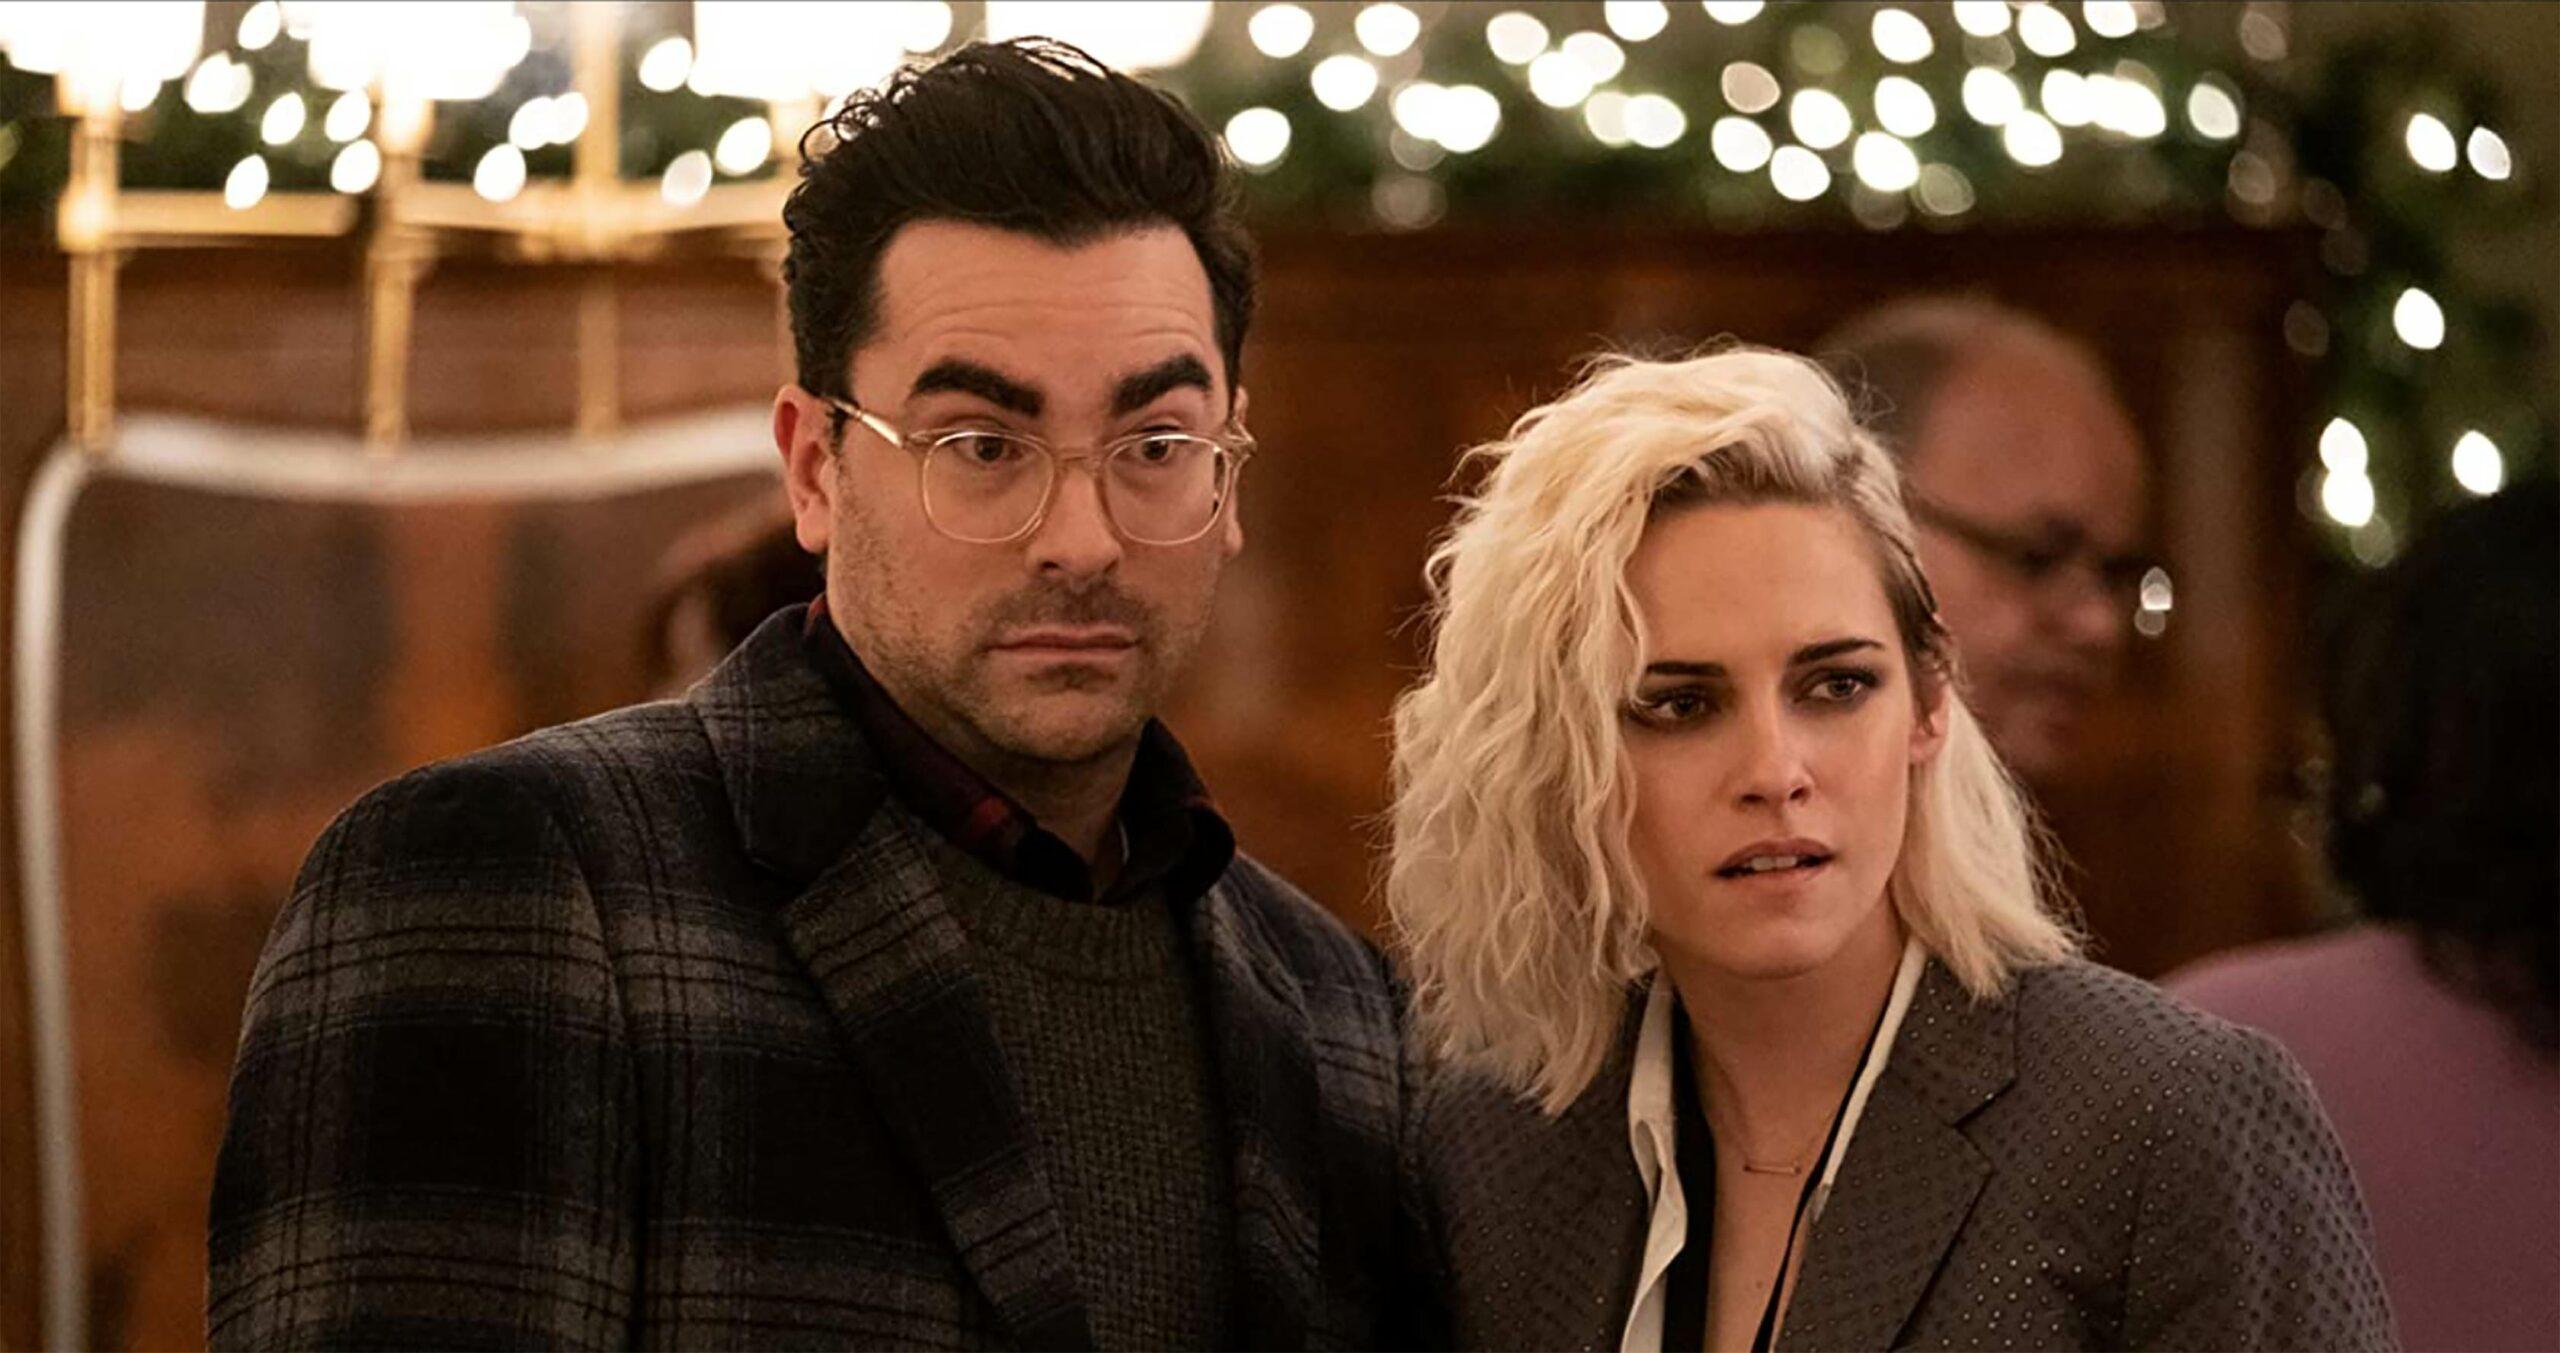 Happiest Season Dan Levy and Kristen Stewart